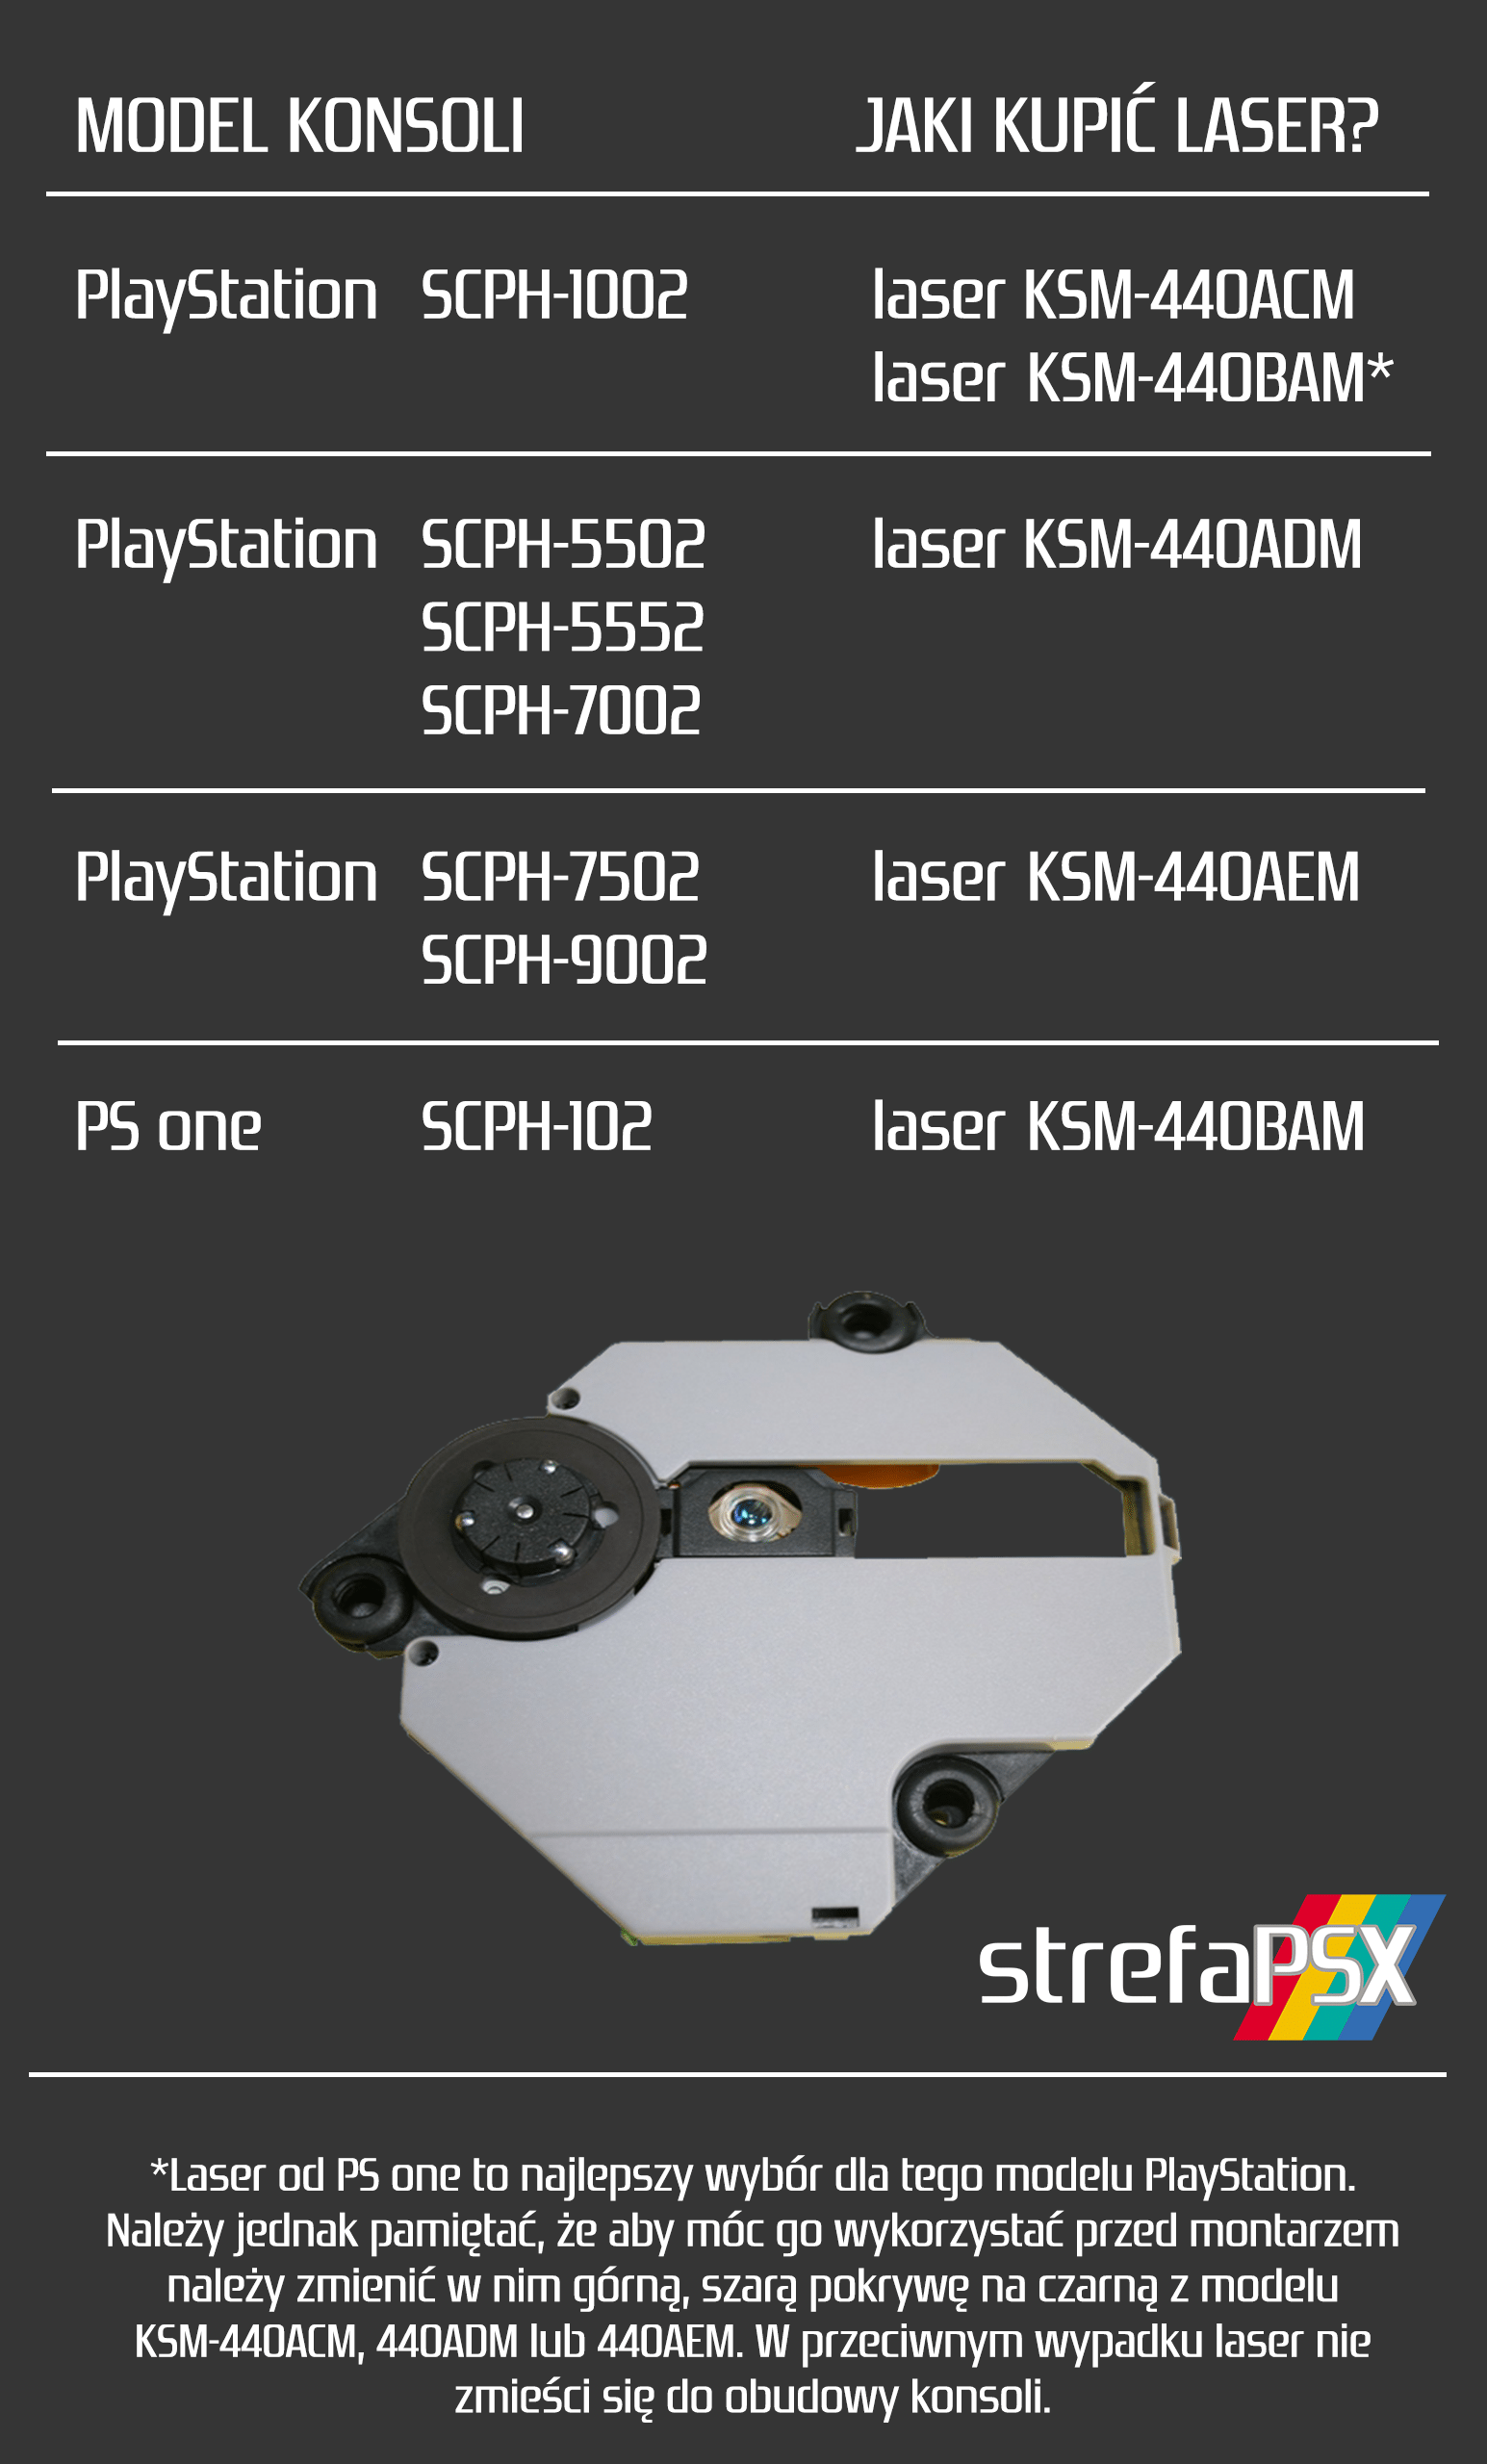 jaki laser do danego modelu playstation new - Jaki laser należy kupić do danego modelu PlayStation?